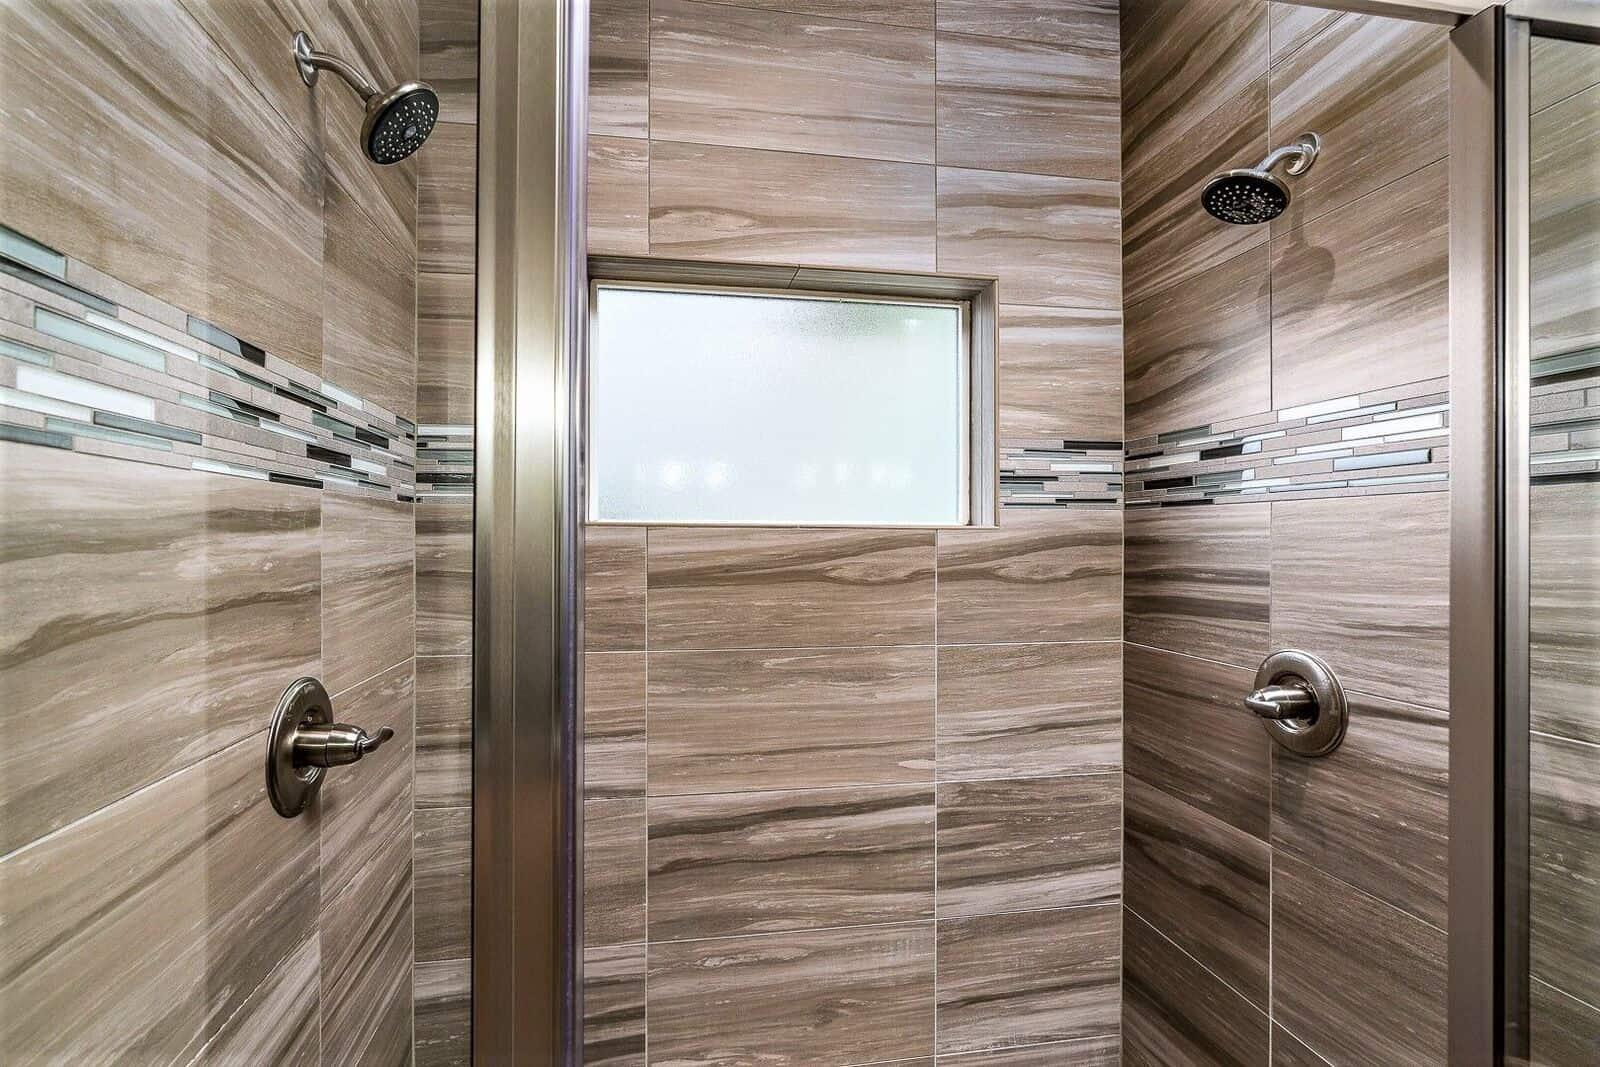 Dual Headed Luxury Shower in Master Bathroom